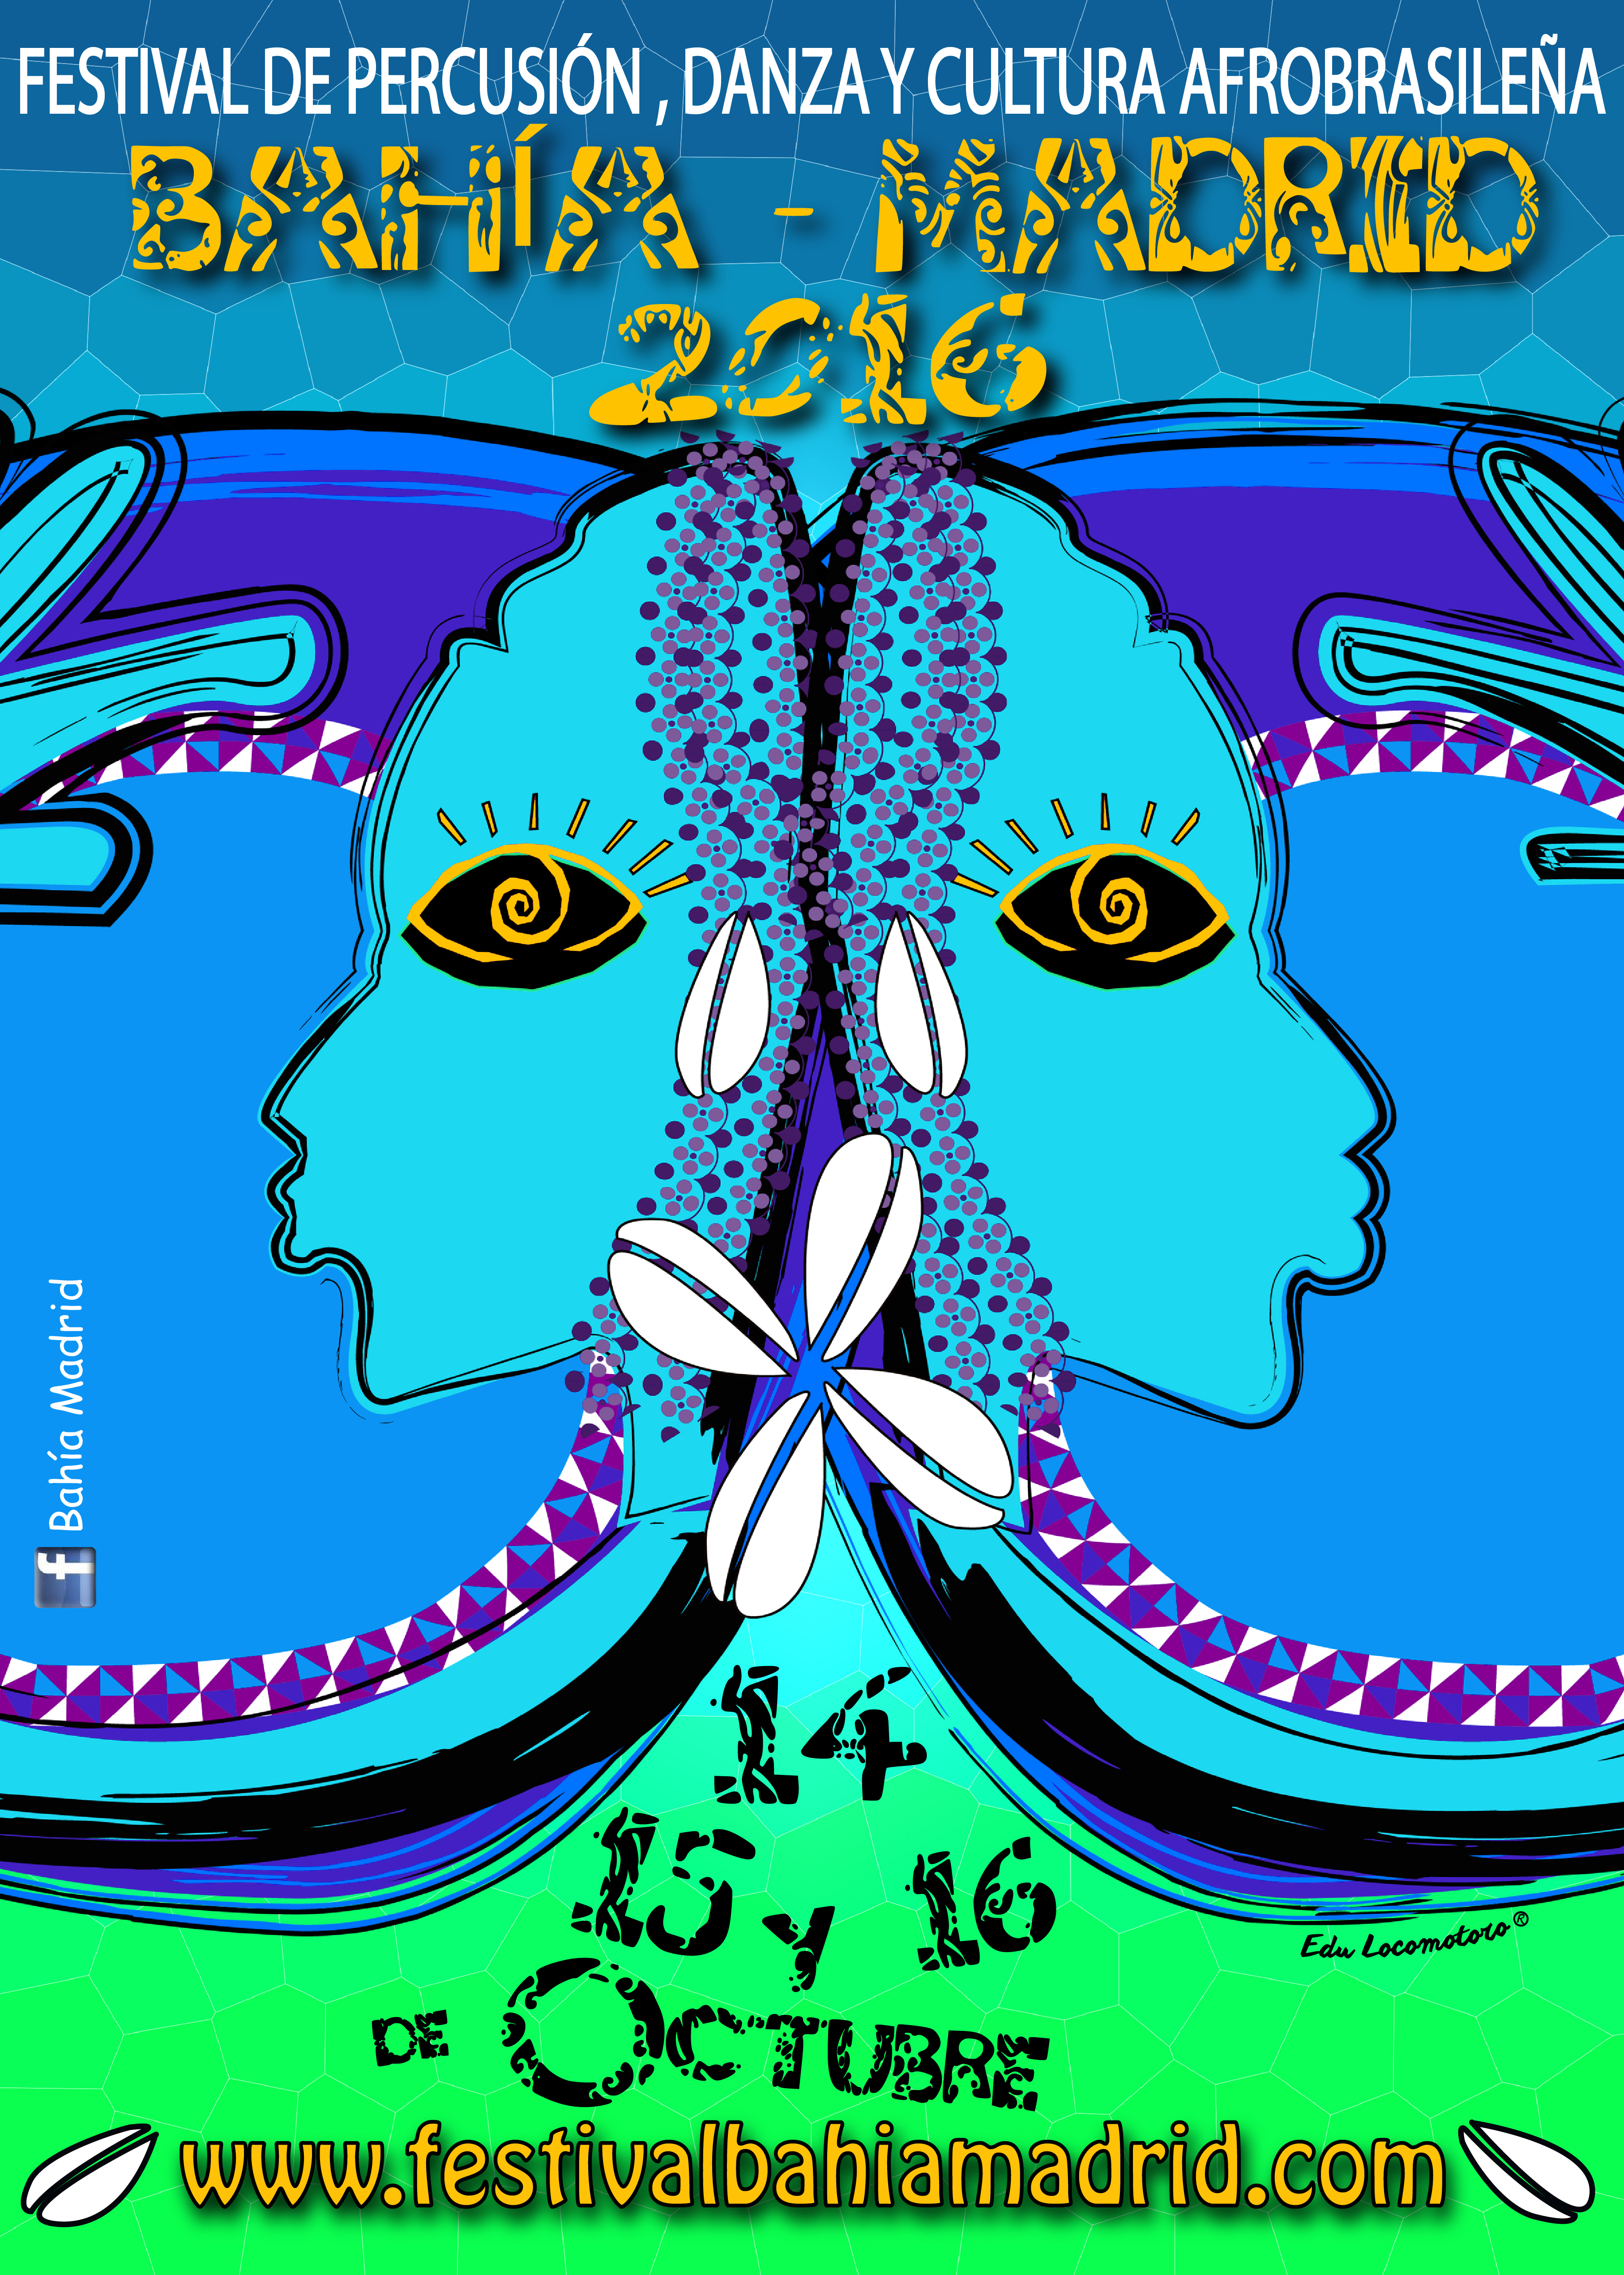 FESTIVAL BAHÍA-MADRID 2016 - Edu Locomotoro (Copyright 2016)